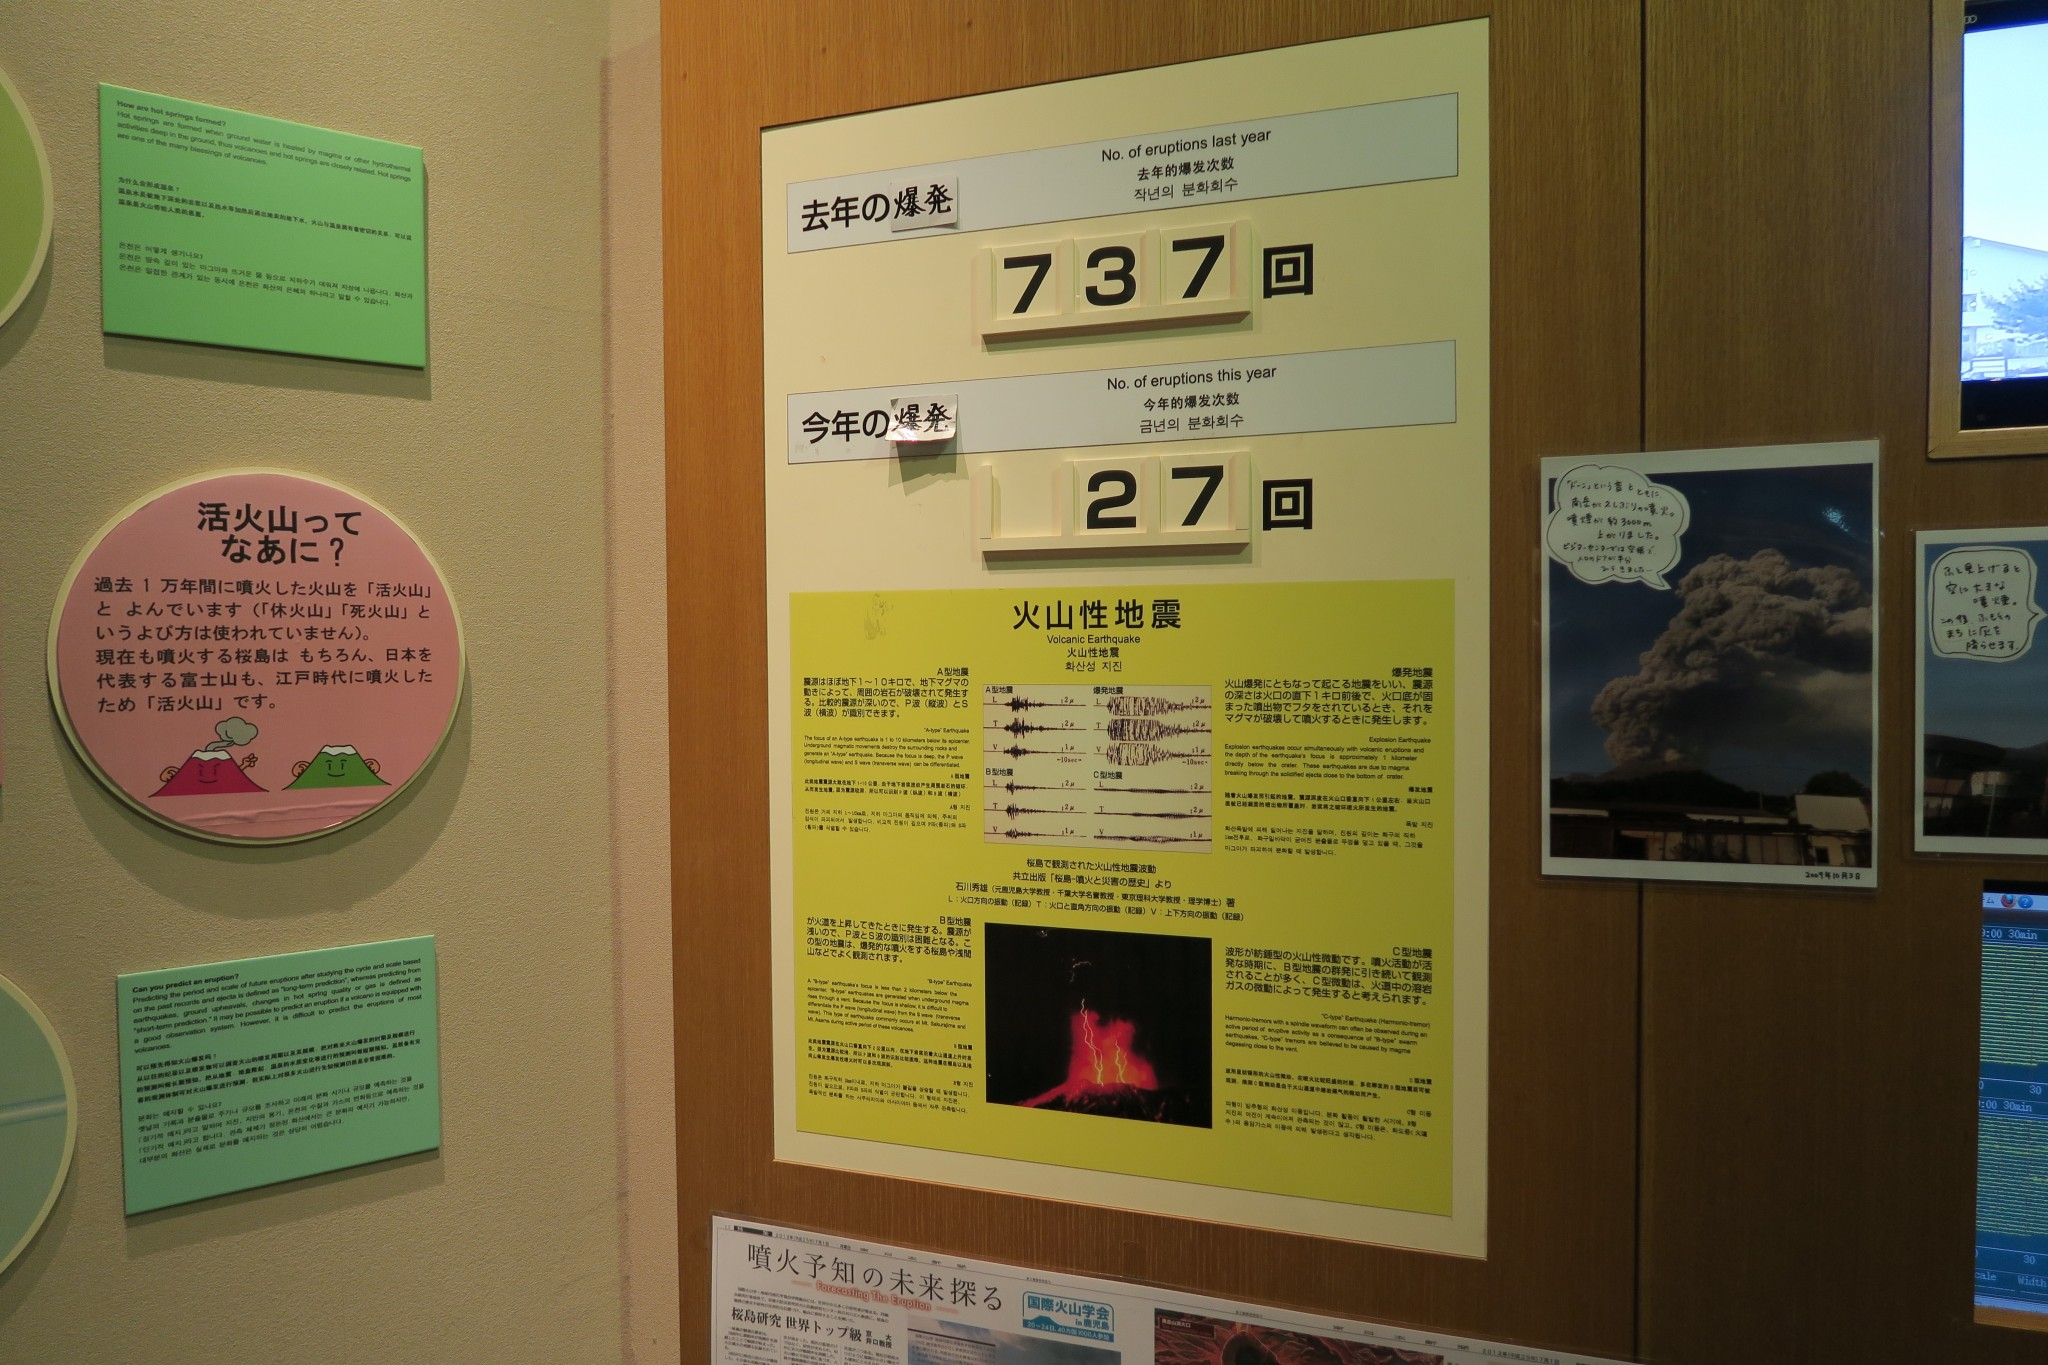 Sakurajima Visitor Center: More Than You Might Expect!